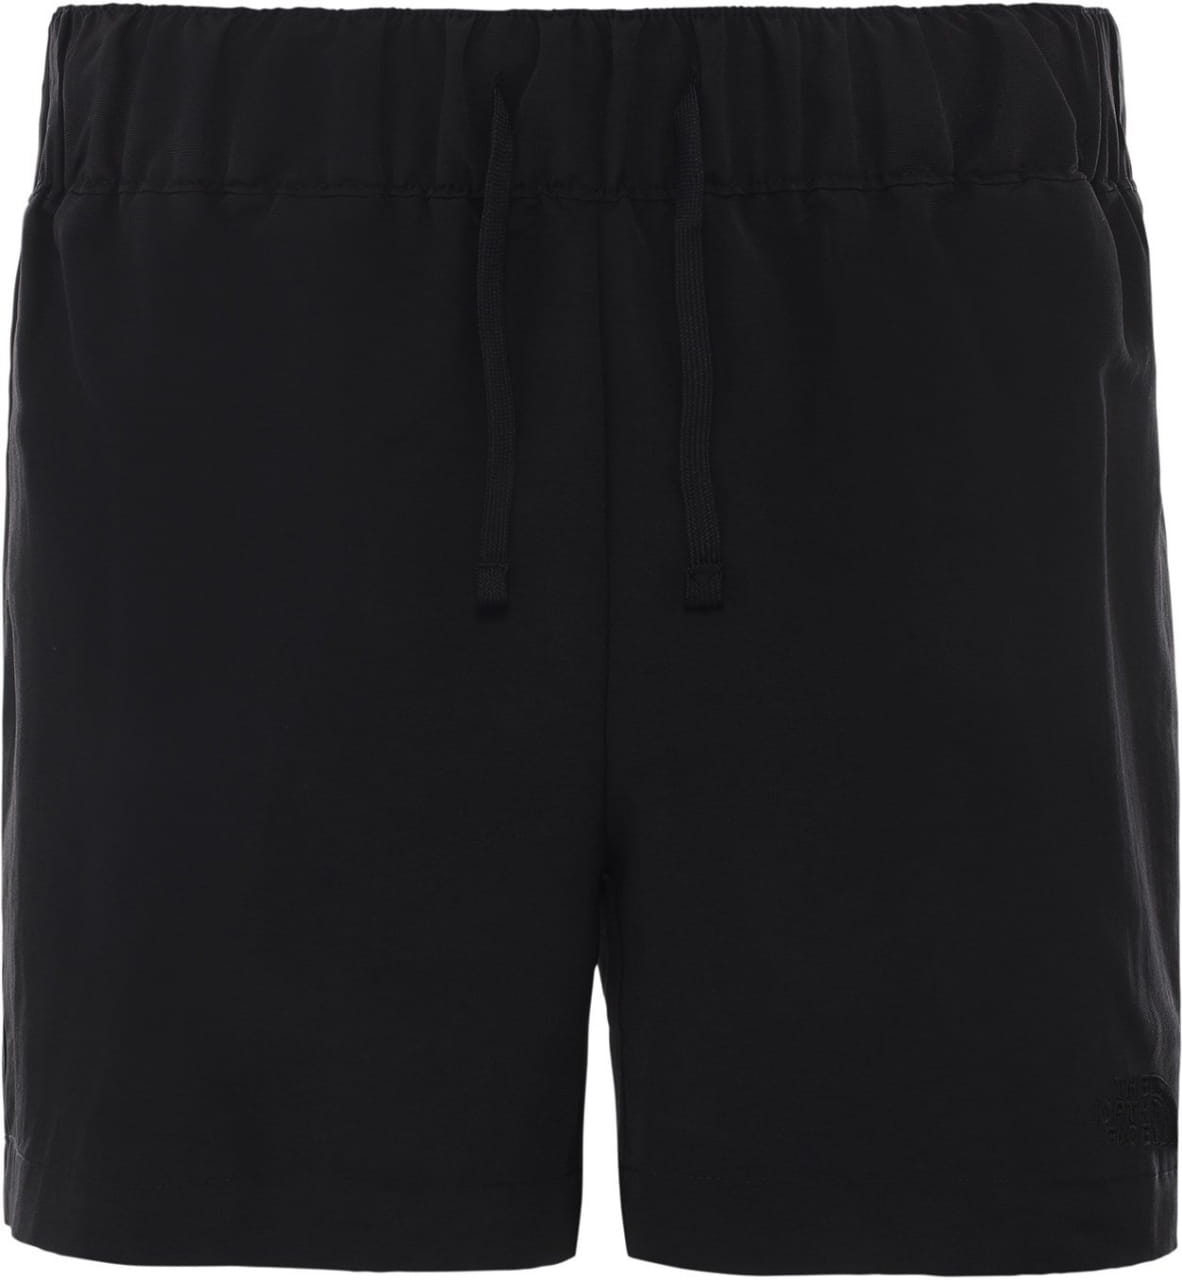 Shorts The North Face Women's Class V Shorts